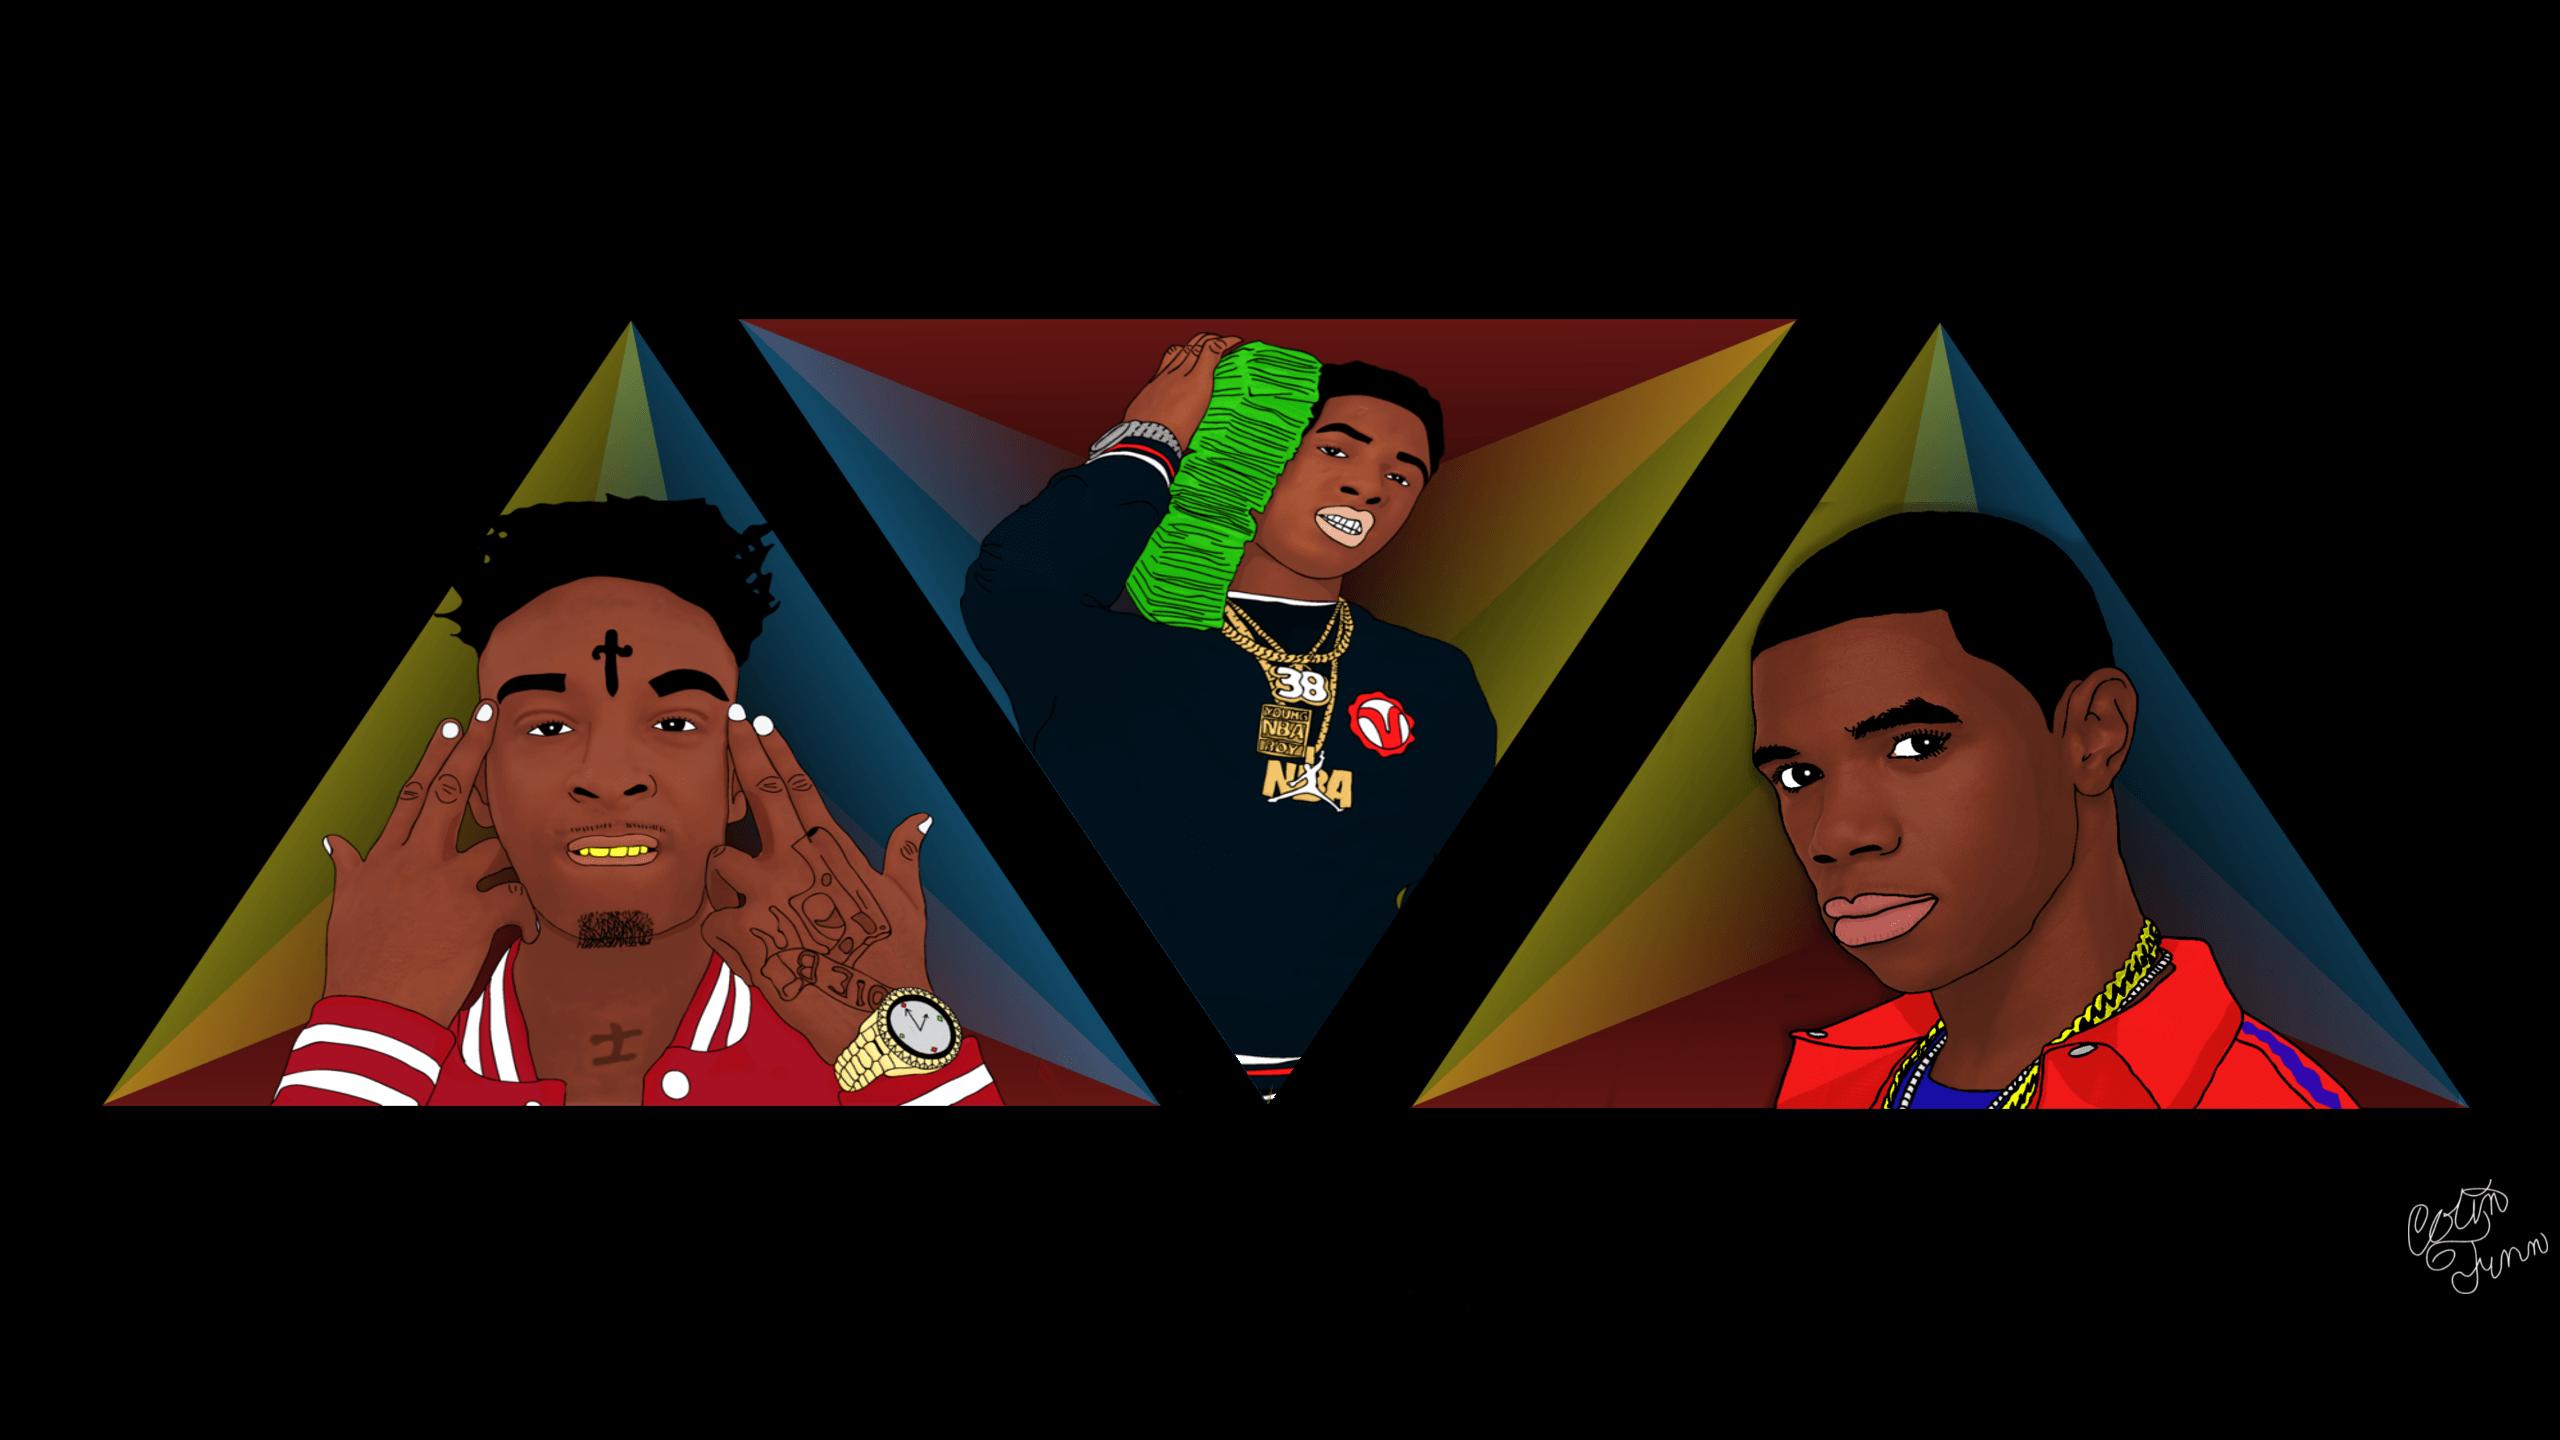 2560x1440 21 Savage Nba Youngboy And A Boogie Fan Art Hiphopimages Cartoon Wallpaper Cartoon Background Cartoon